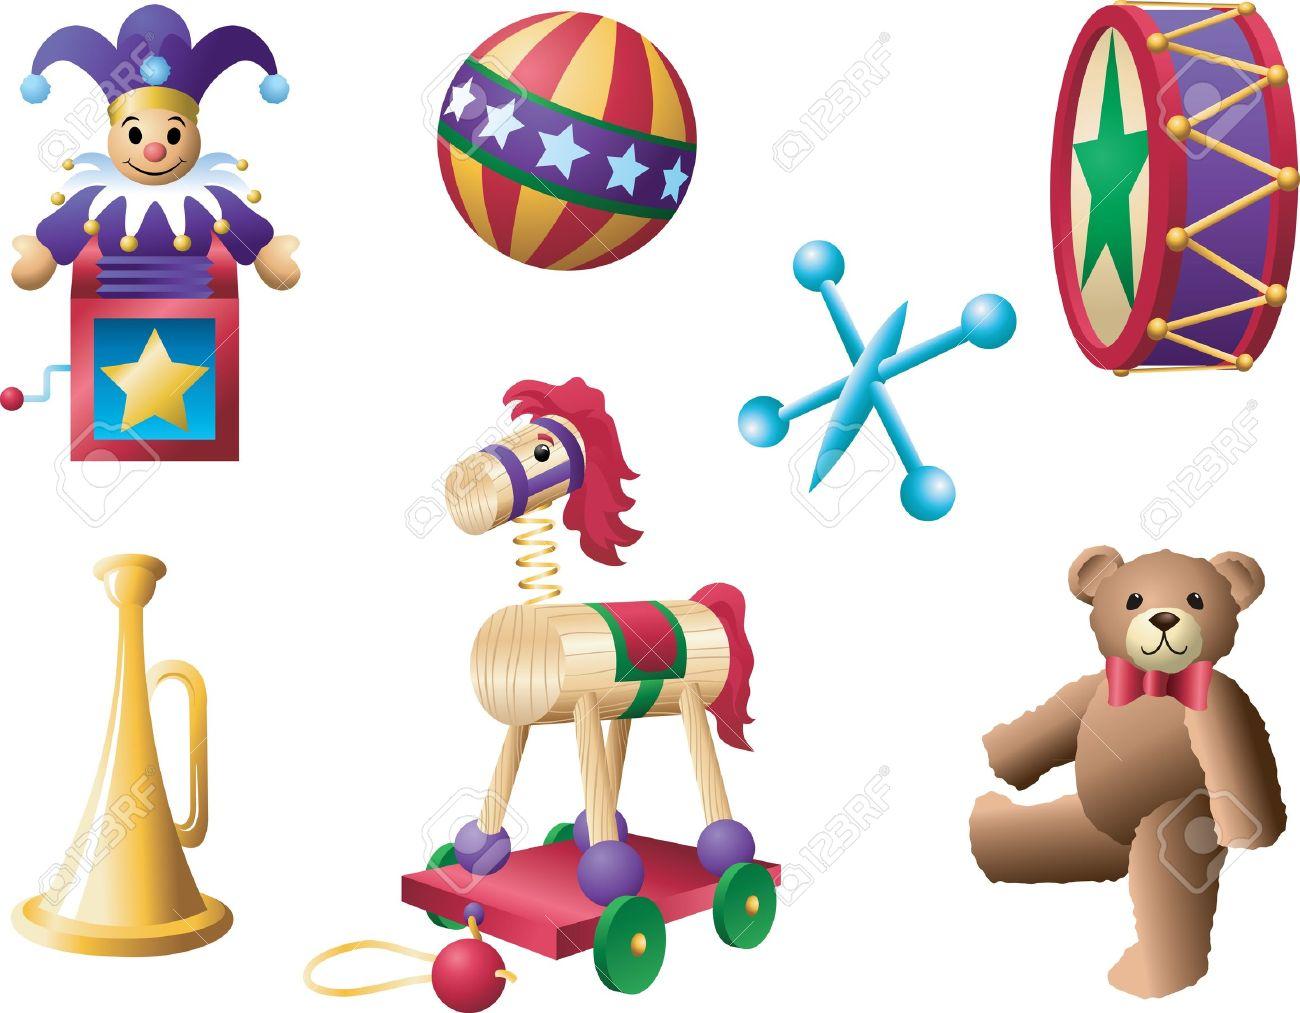 Christmas Toys Stock Photos. Royalty Free Christmas Toys Images ...